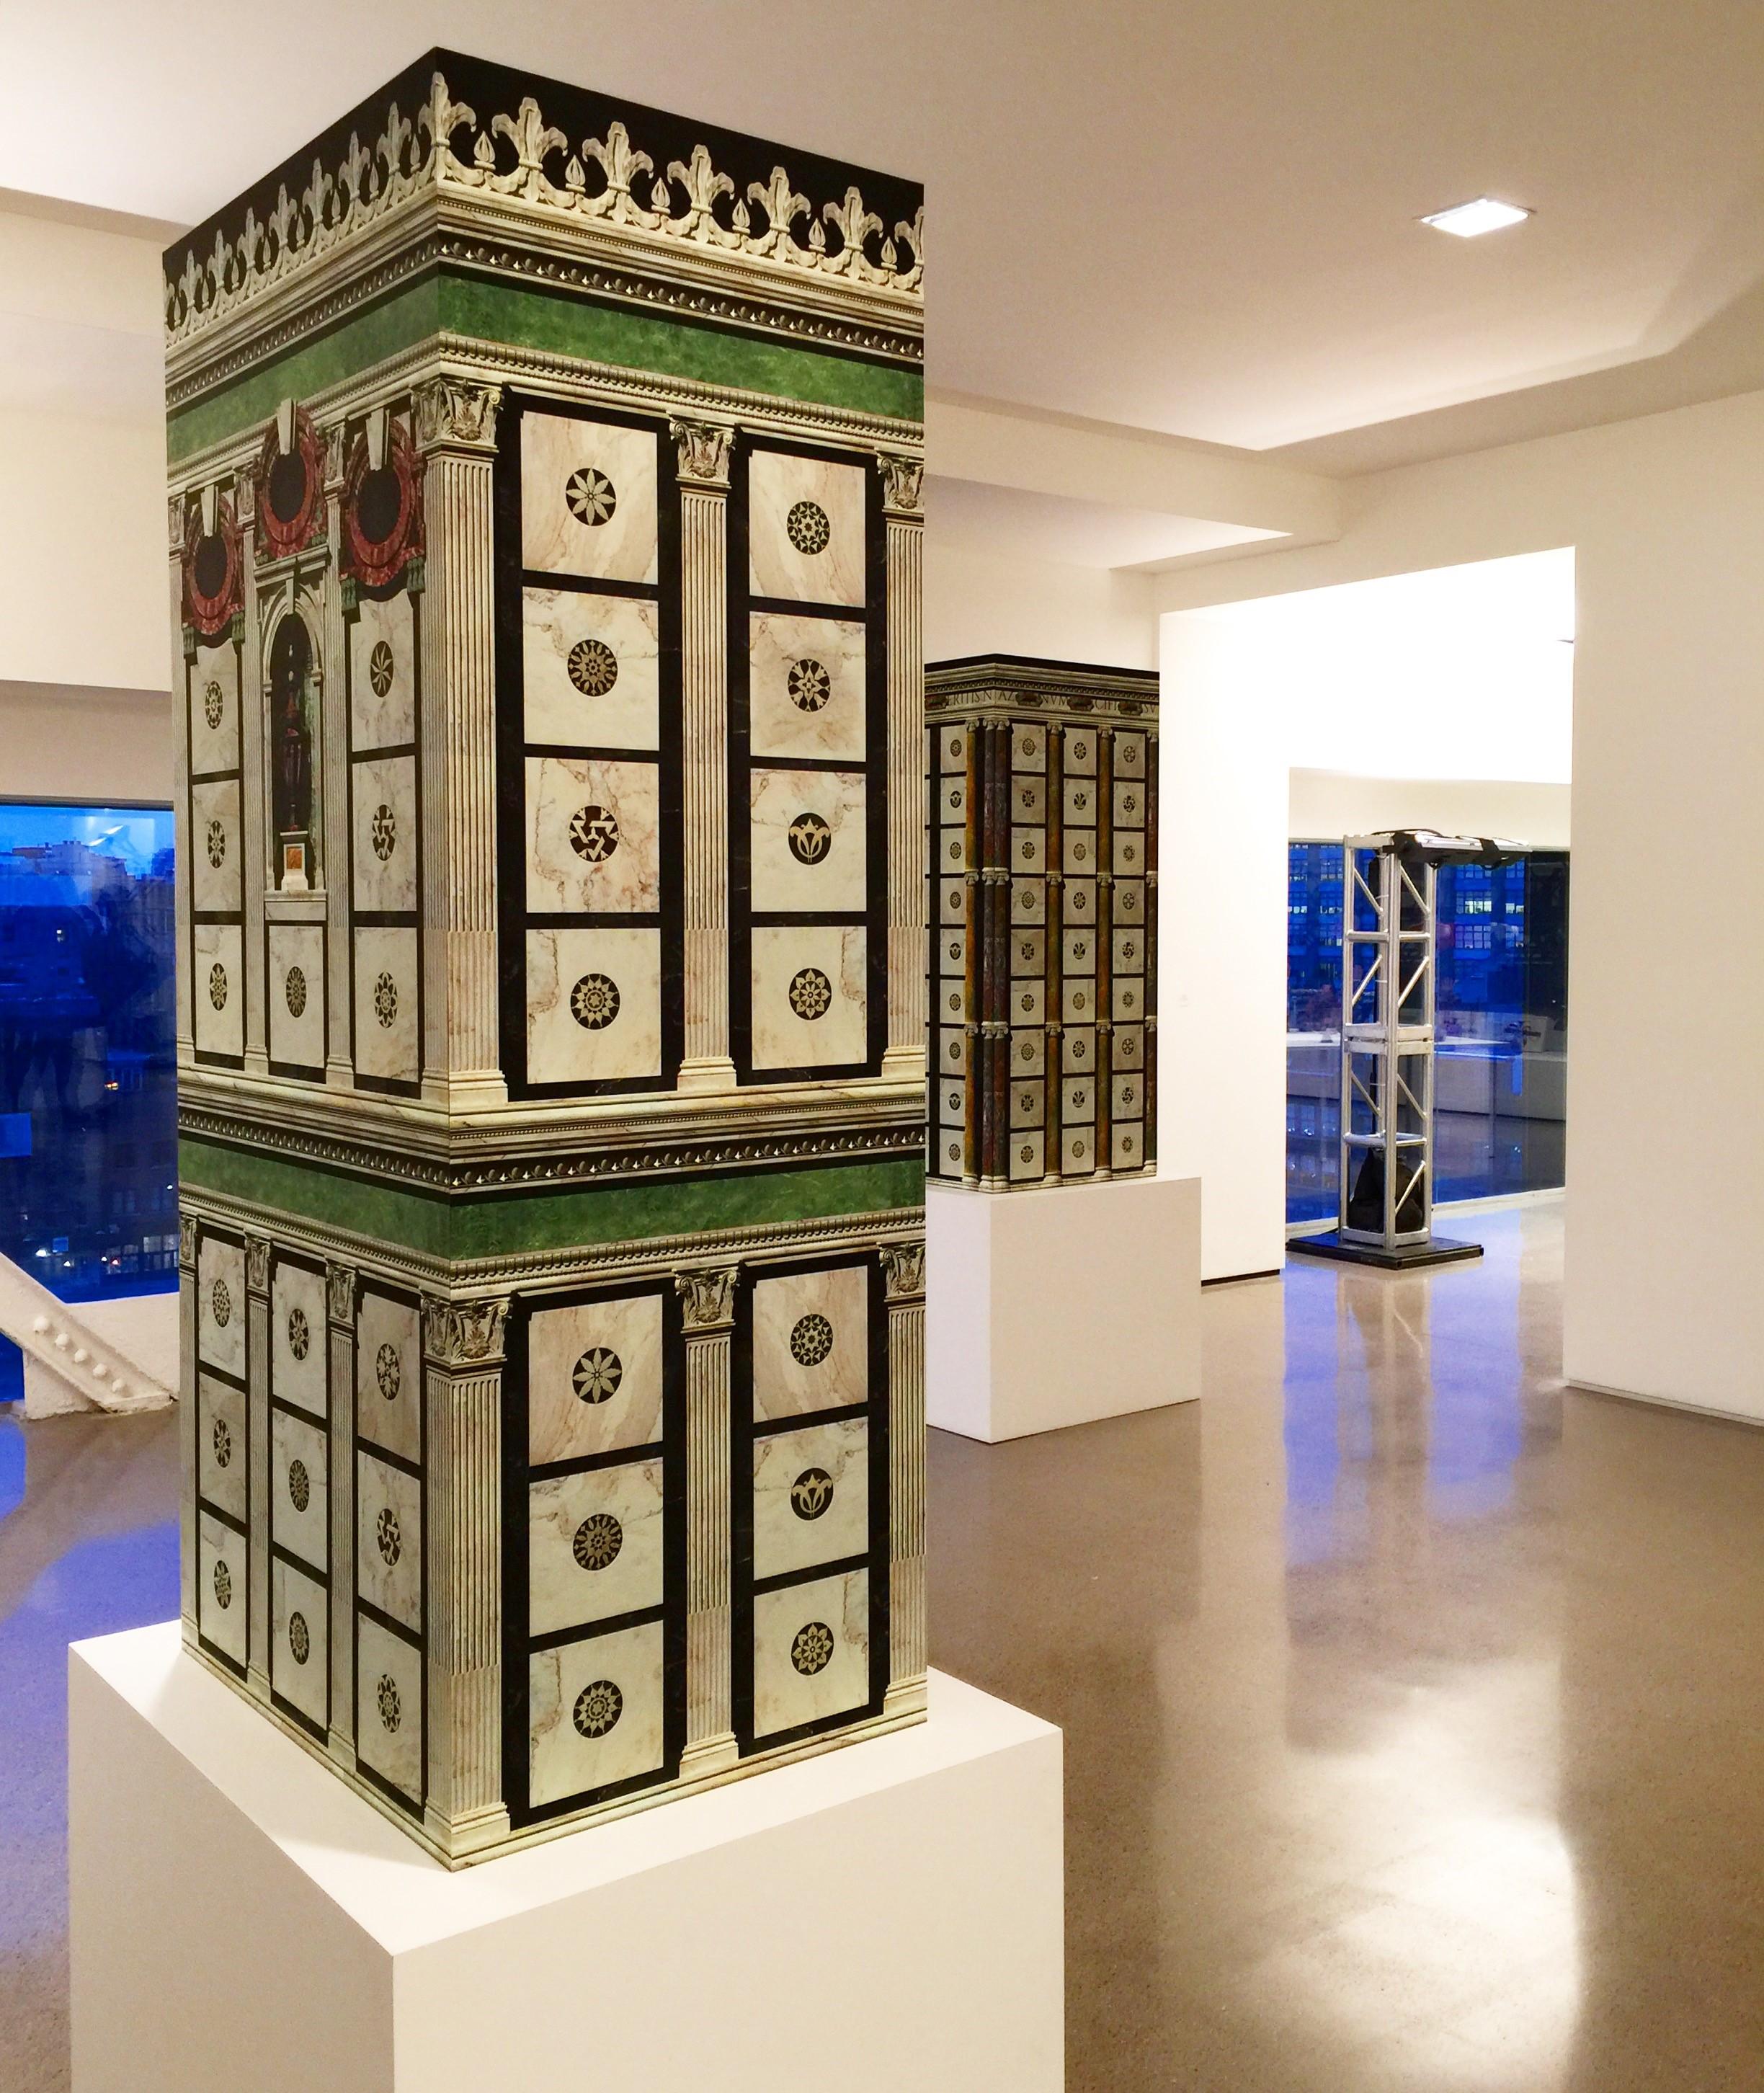 Pablo Bronstein's sculptures at Independent